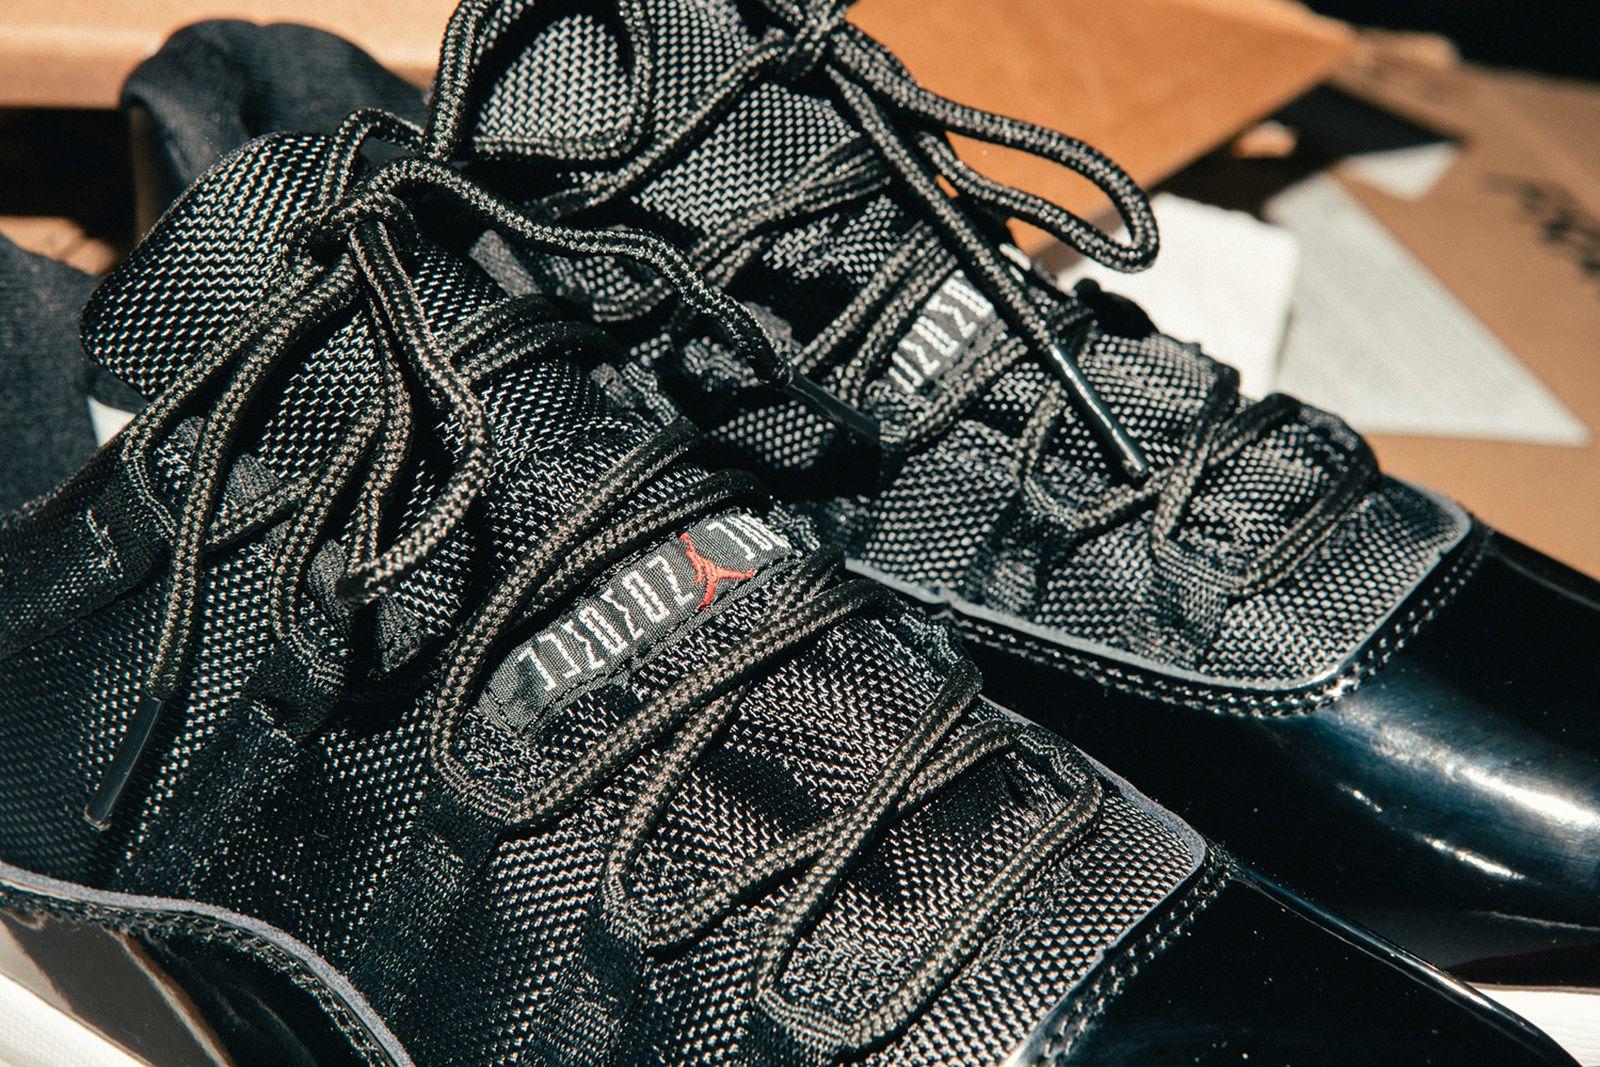 Legit-Check-Fake-Sneakers-Highsnobiety-19